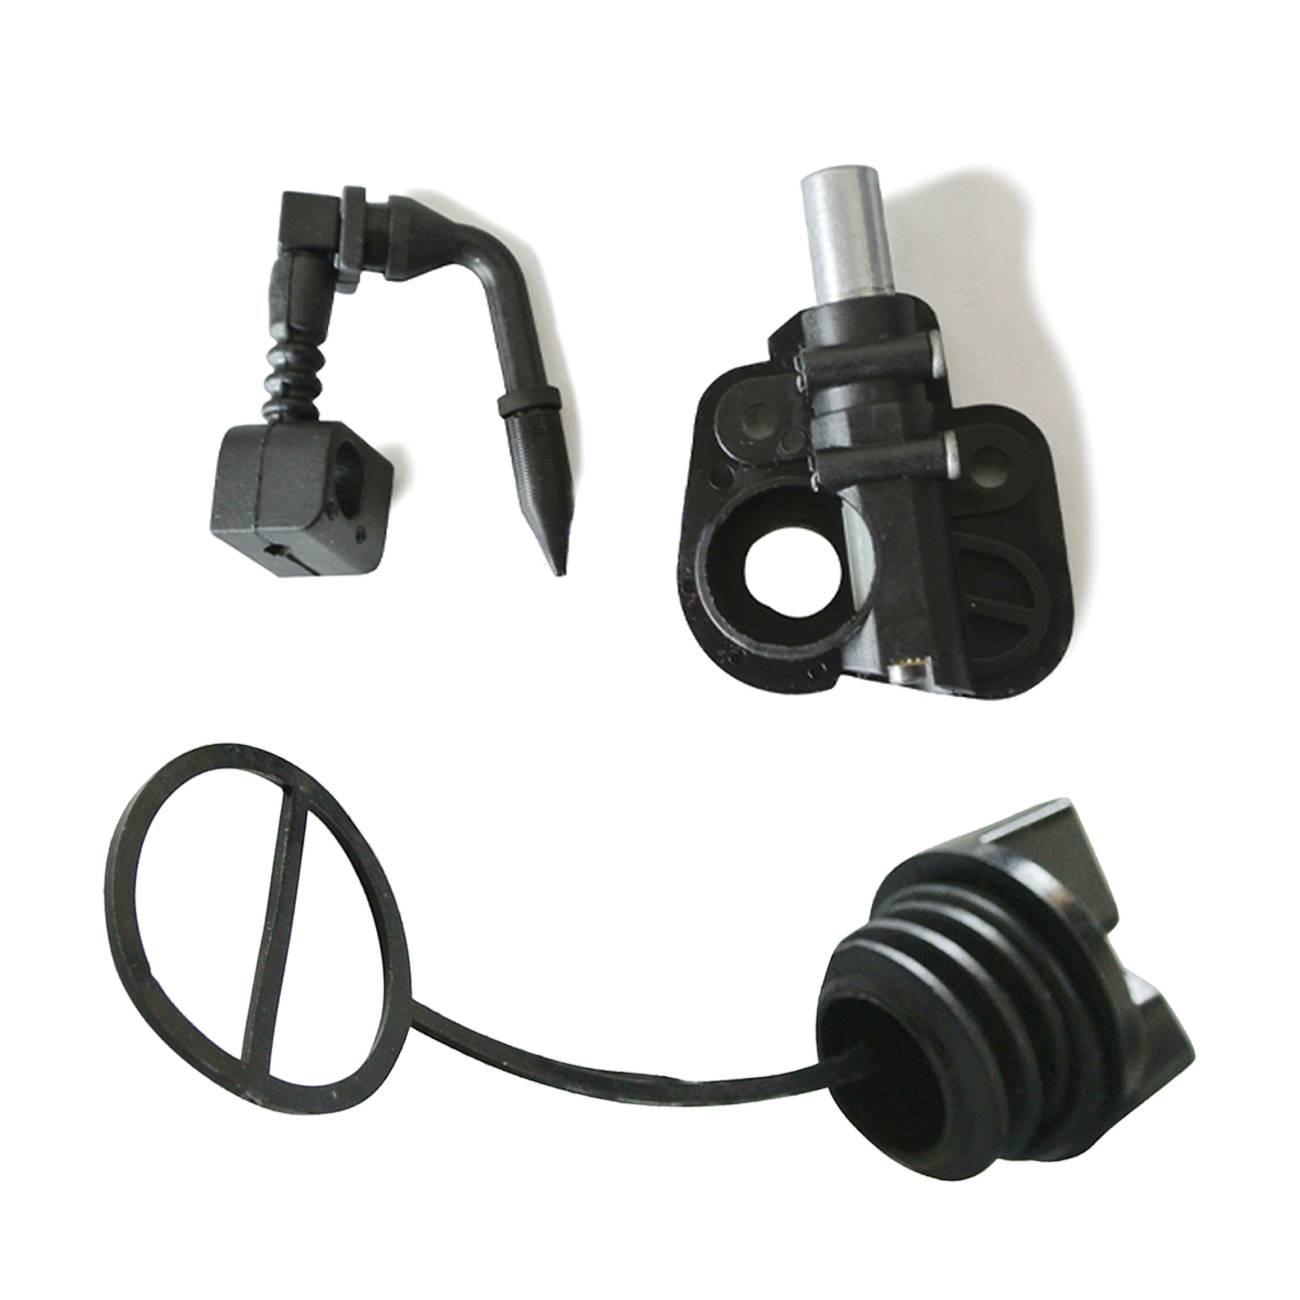 Oil Pump & Oil Filler Cap Kit Fit PARTNER 350 351 352 370 371 Chainsaw